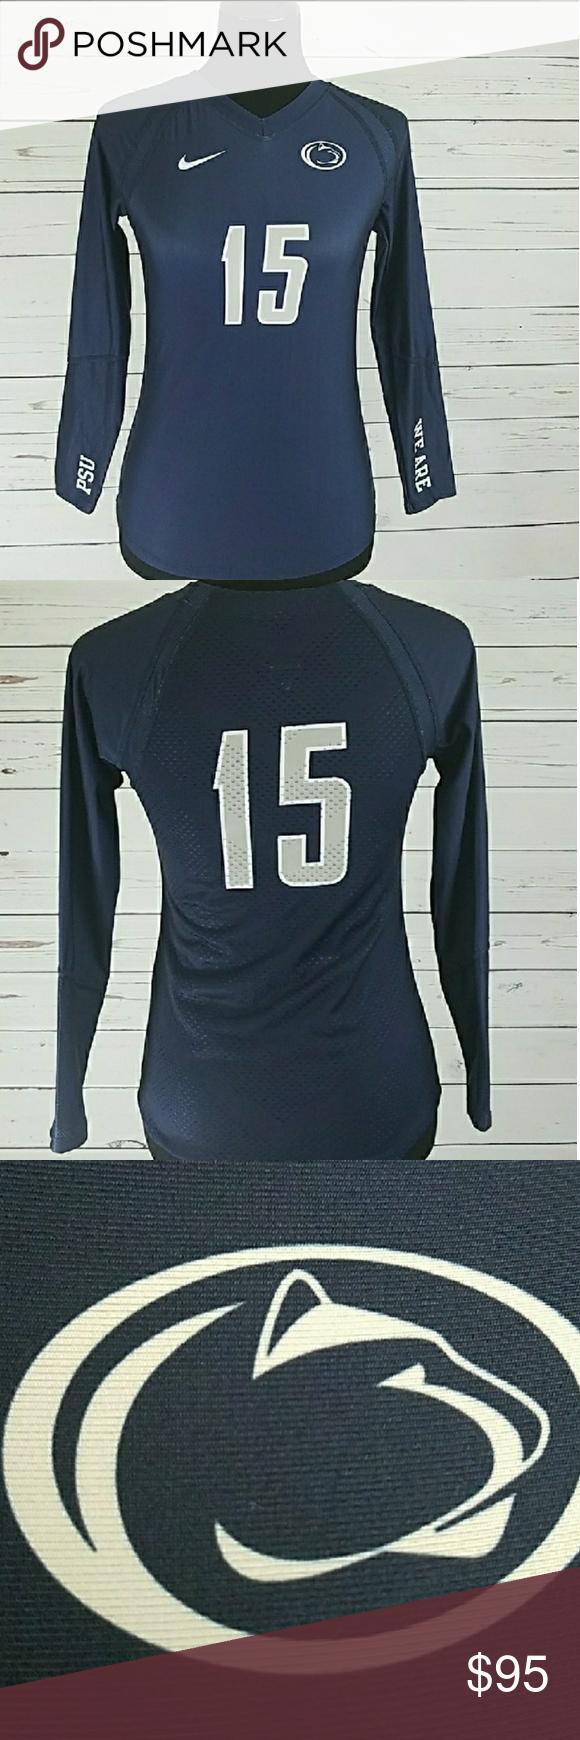 Nike Penn State Volleyball Jersey Medium Nwt Volleyball Jerseys Penn State Volleyball Jersey